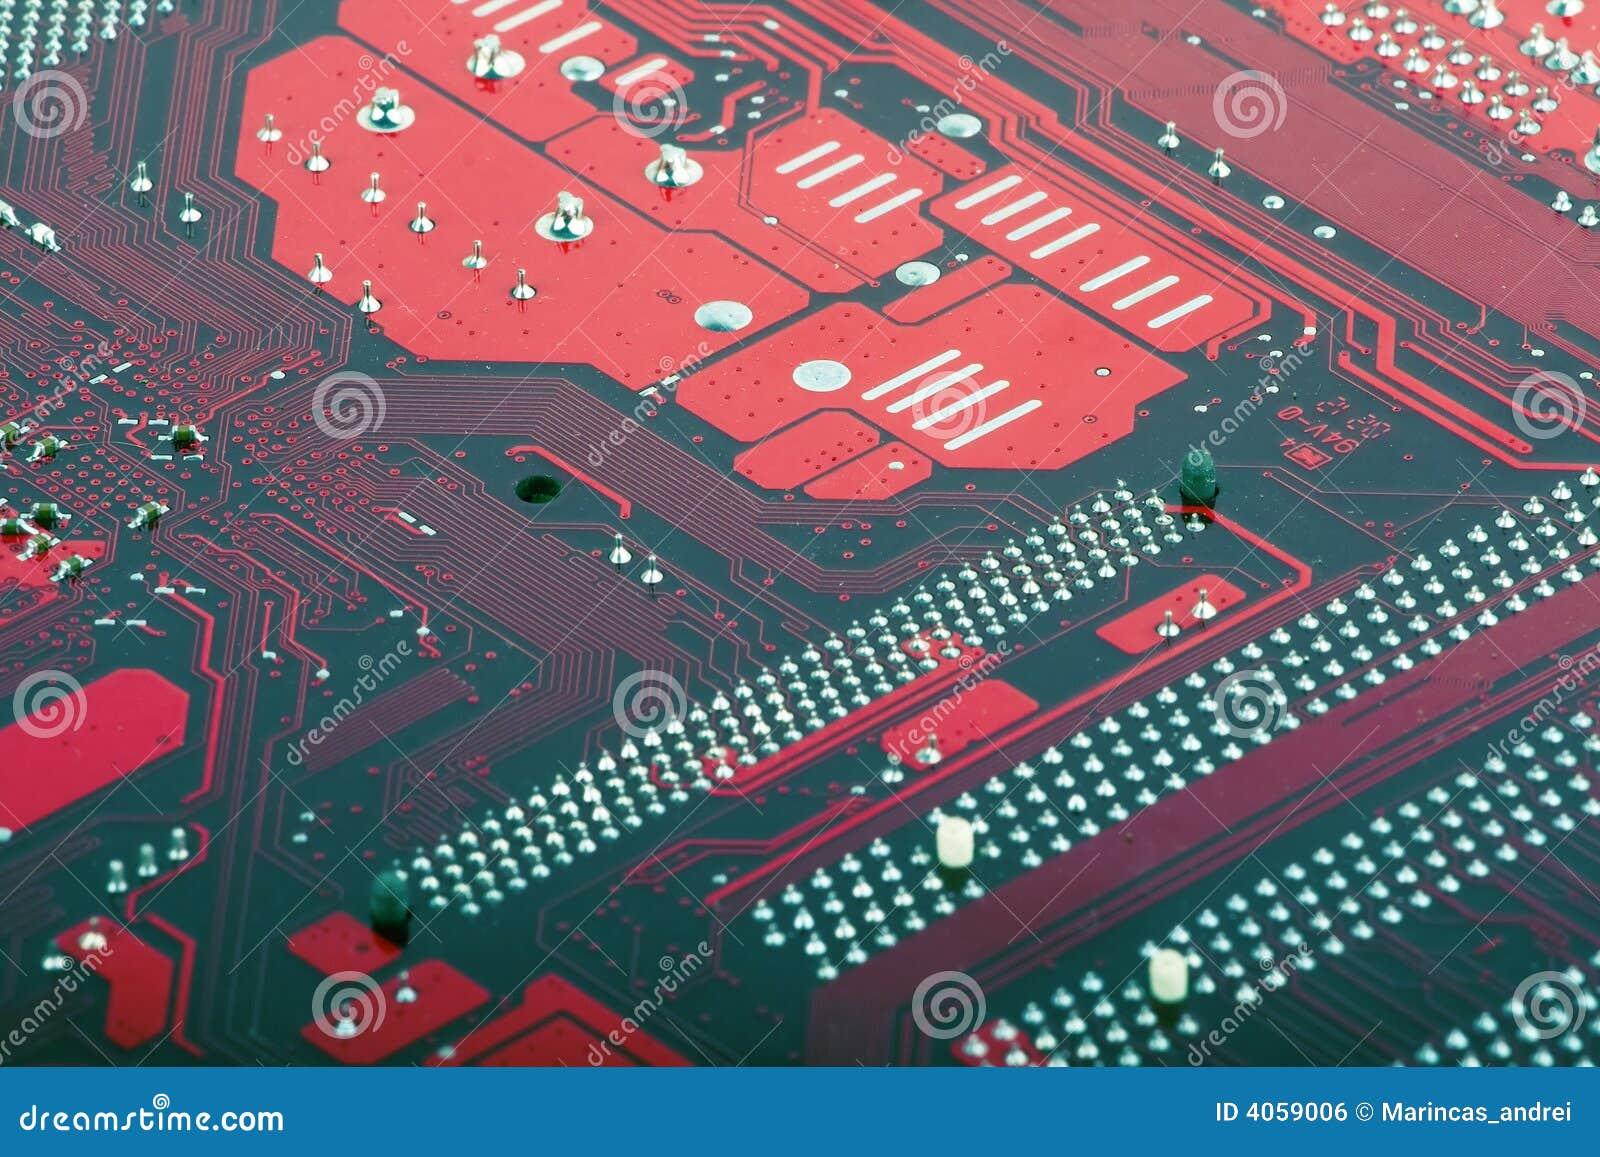 Computer circuit motherboard